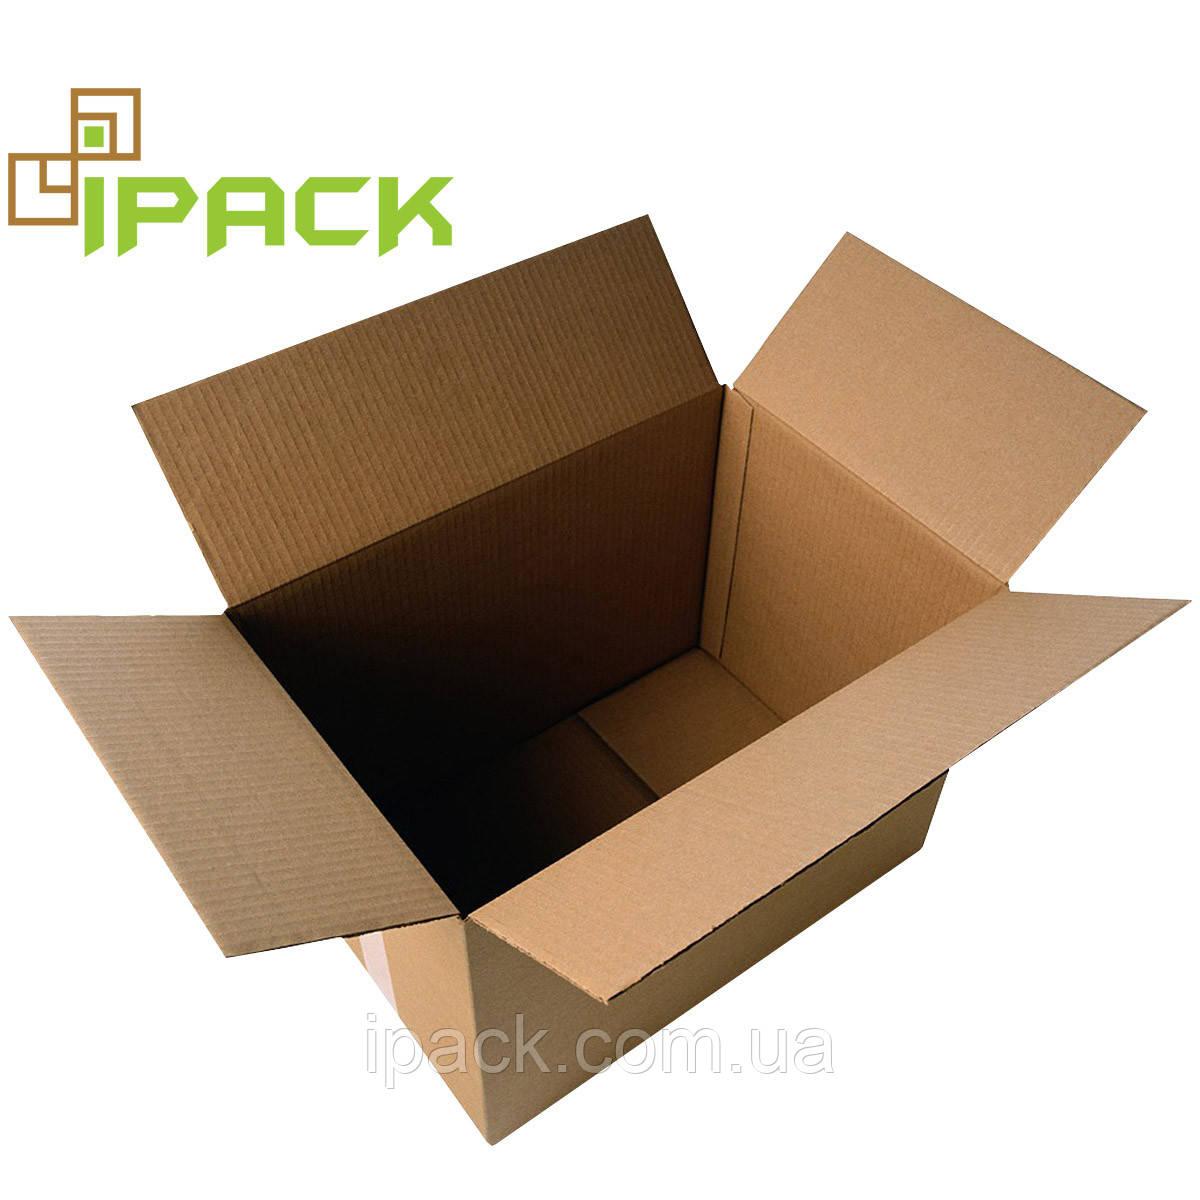 Гофроящик 420*295*200 мм бурий четырехклапанный картонний короб